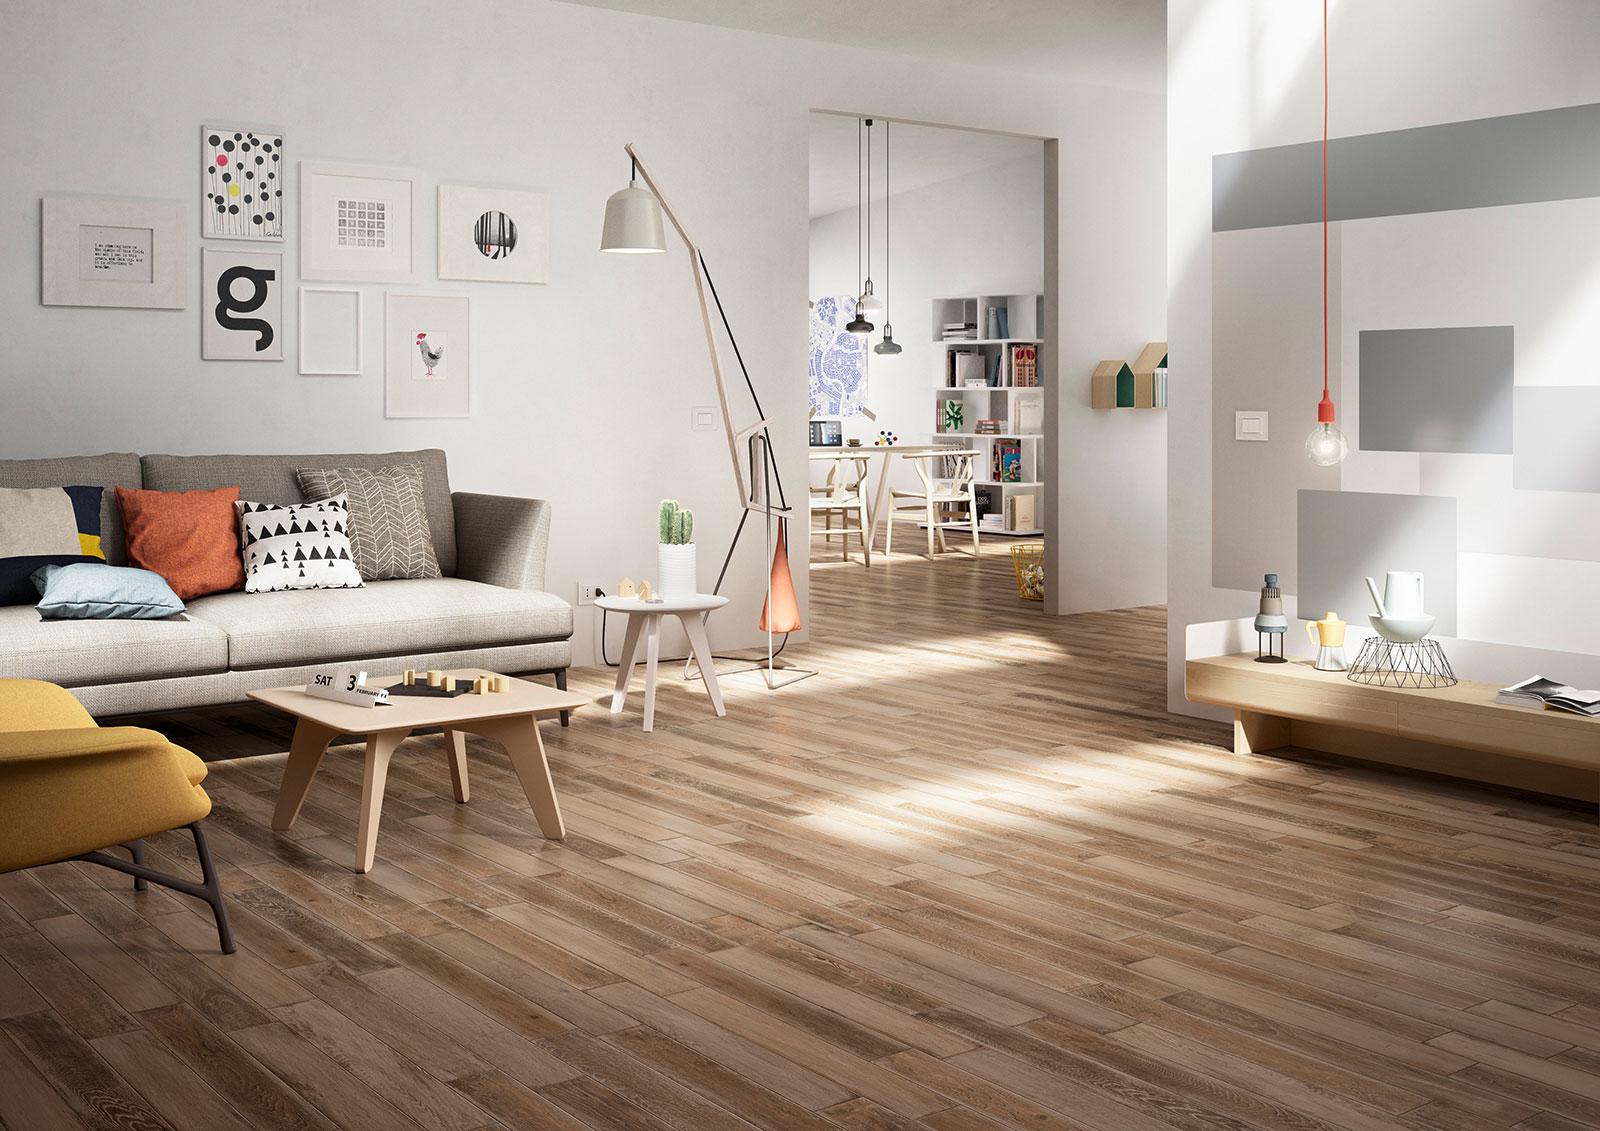 Treverkage wood effect stoneware flooring marazzi - Suelo imitacion parquet ...